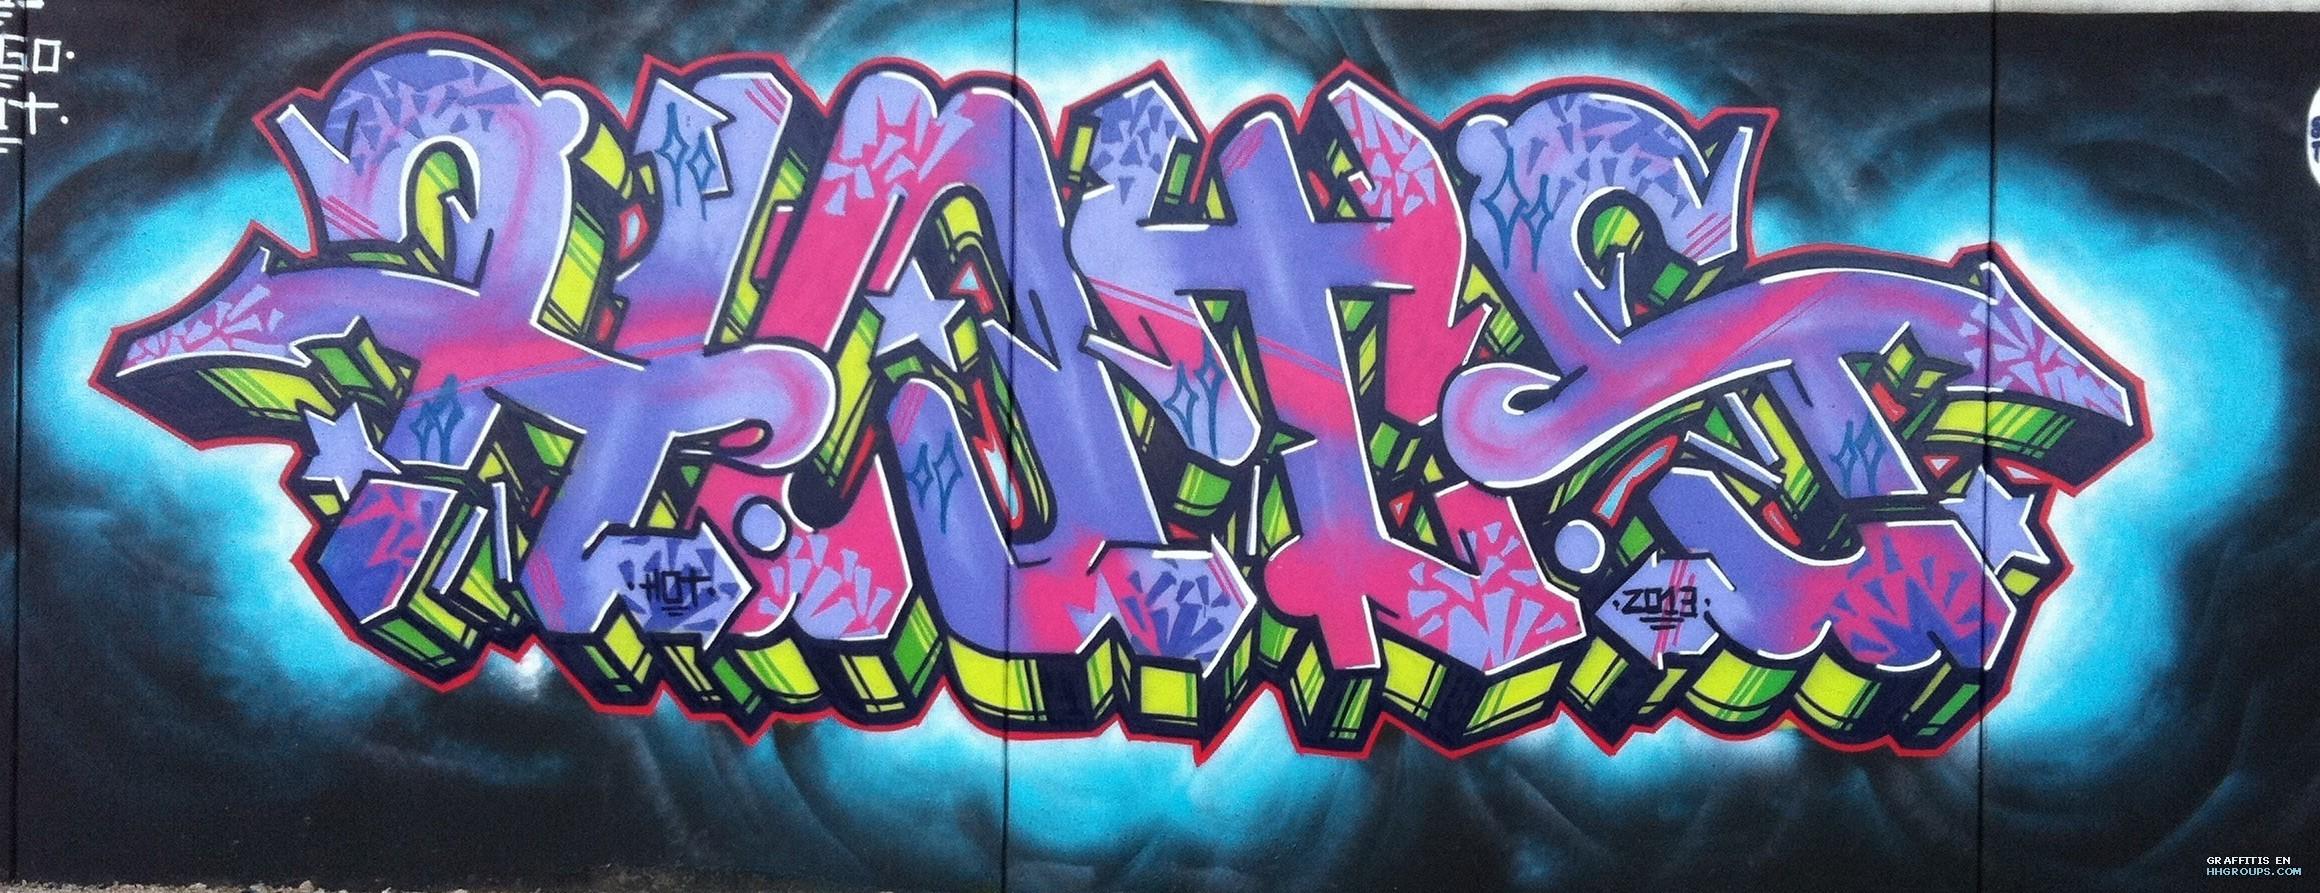 Graffiti de Hot en Madrid